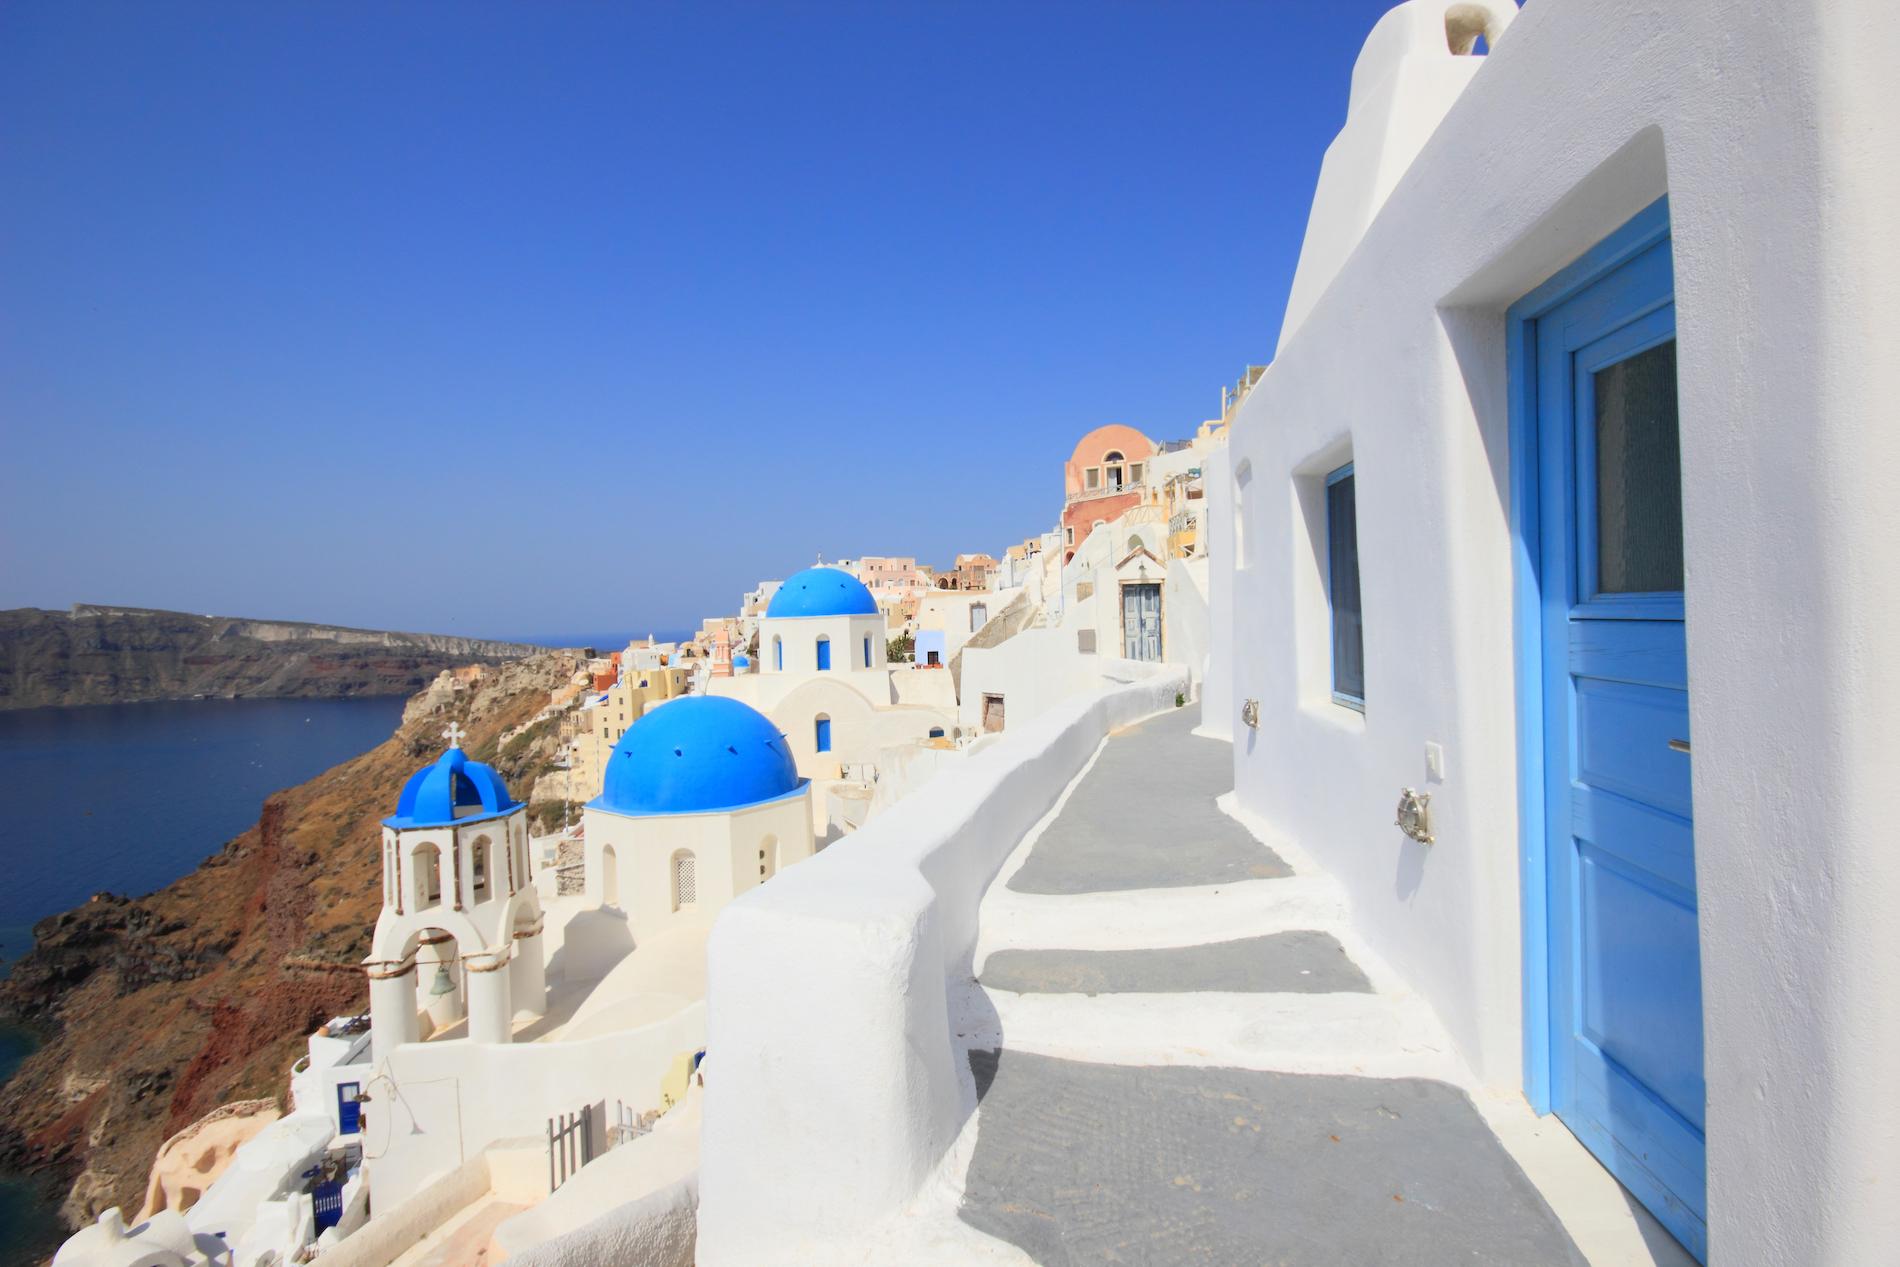 Etihad to commence seasonal flights to Greece and Spain